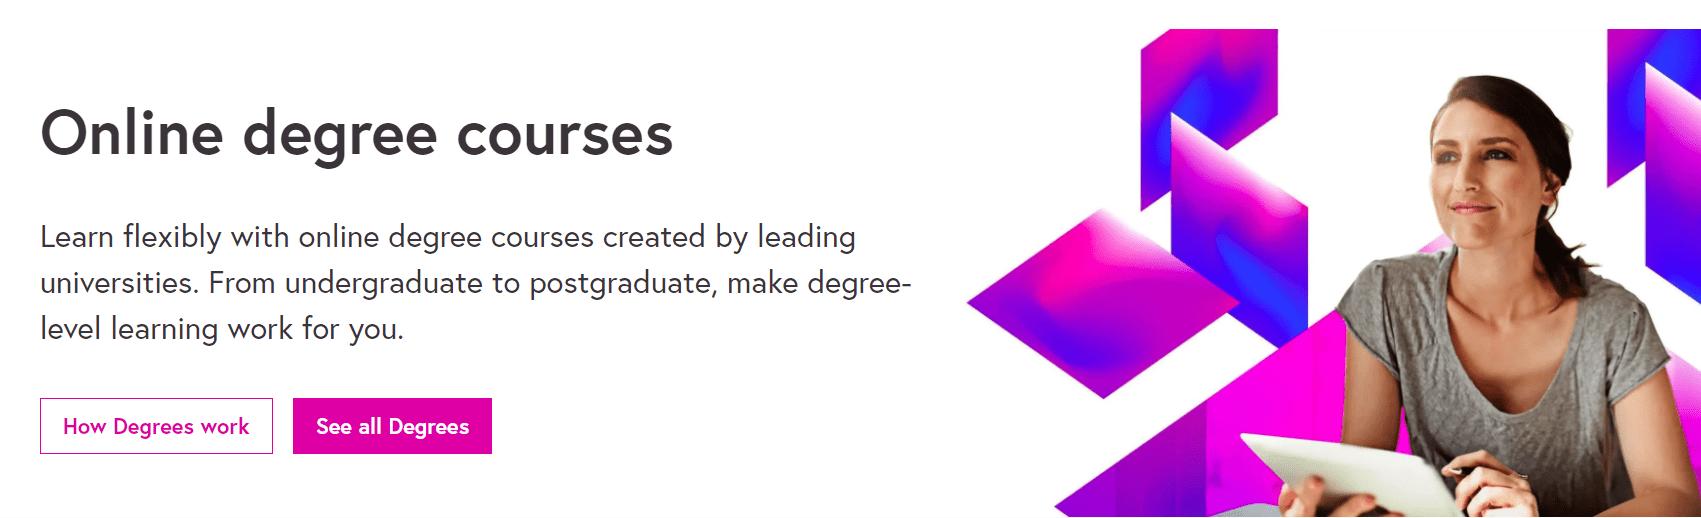 FutureLearn - Online degree courses